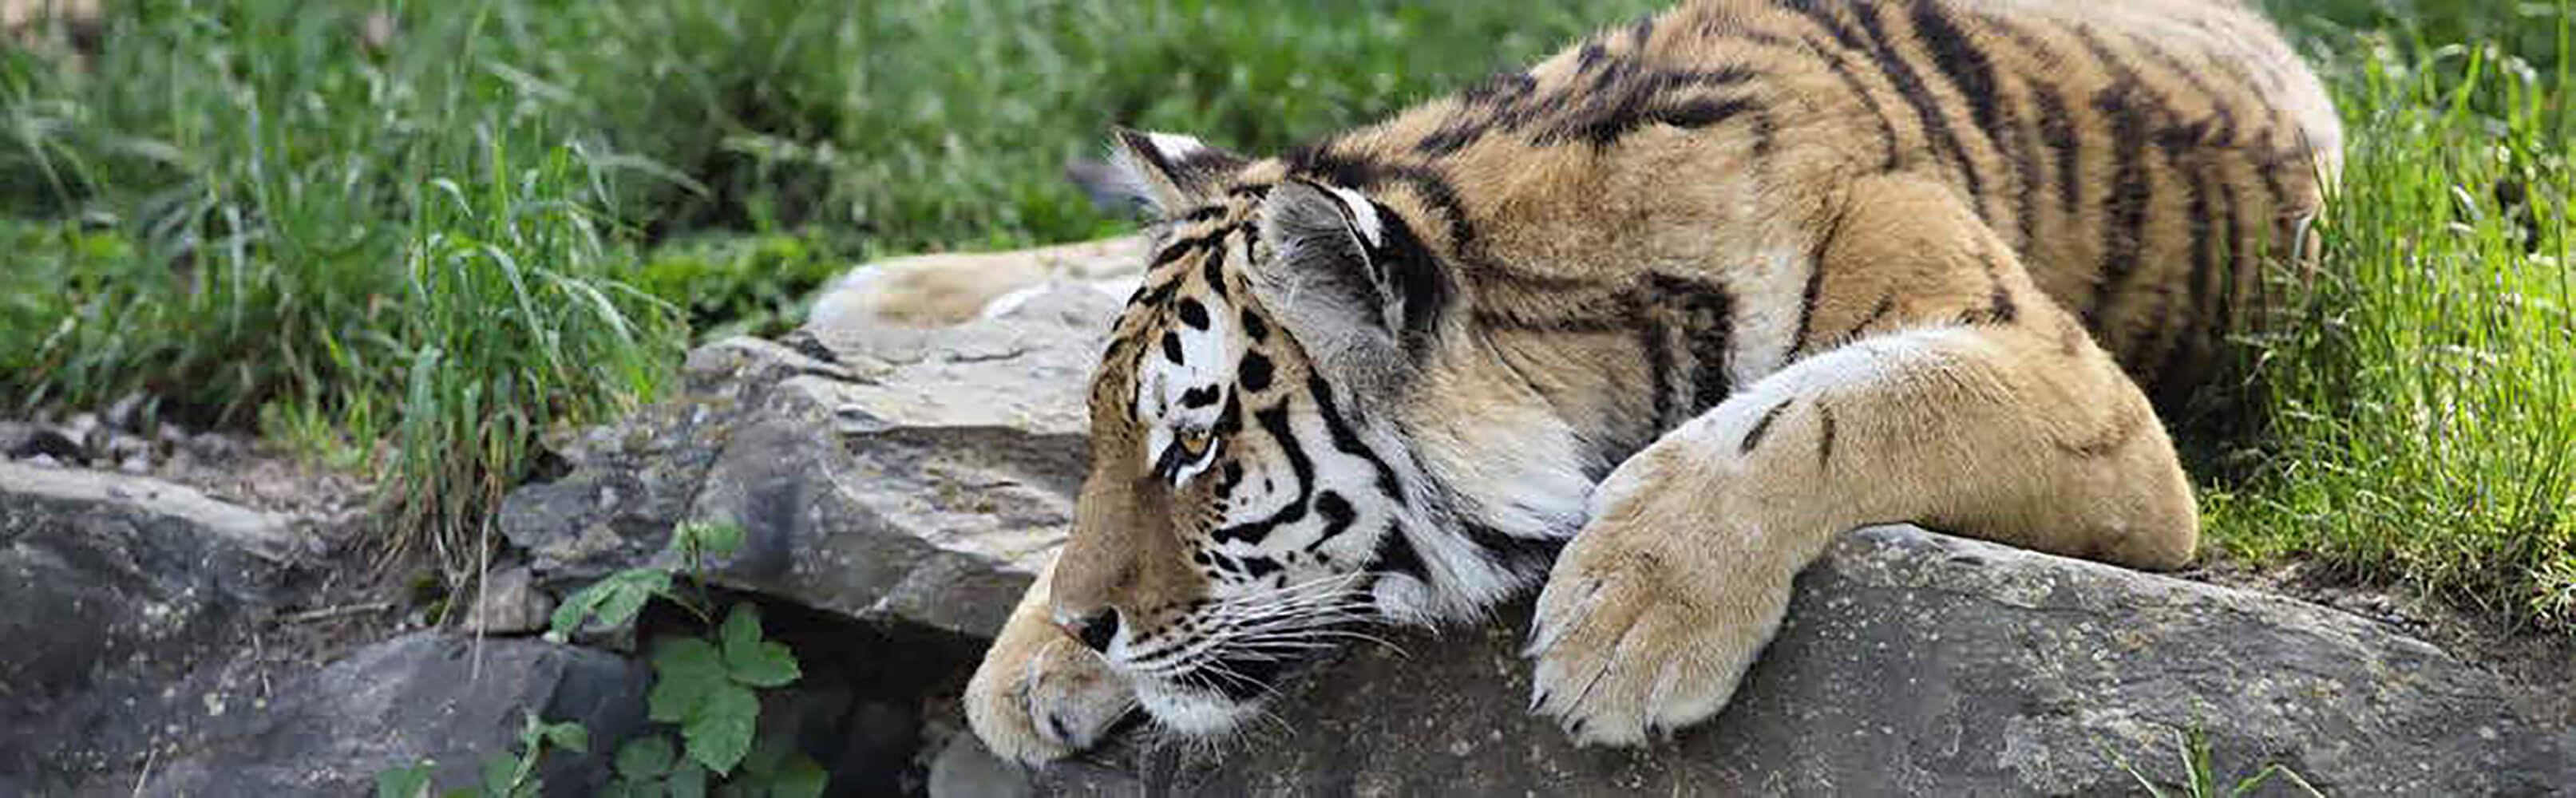 Abenteuerland Walter Zoo Gossau 1